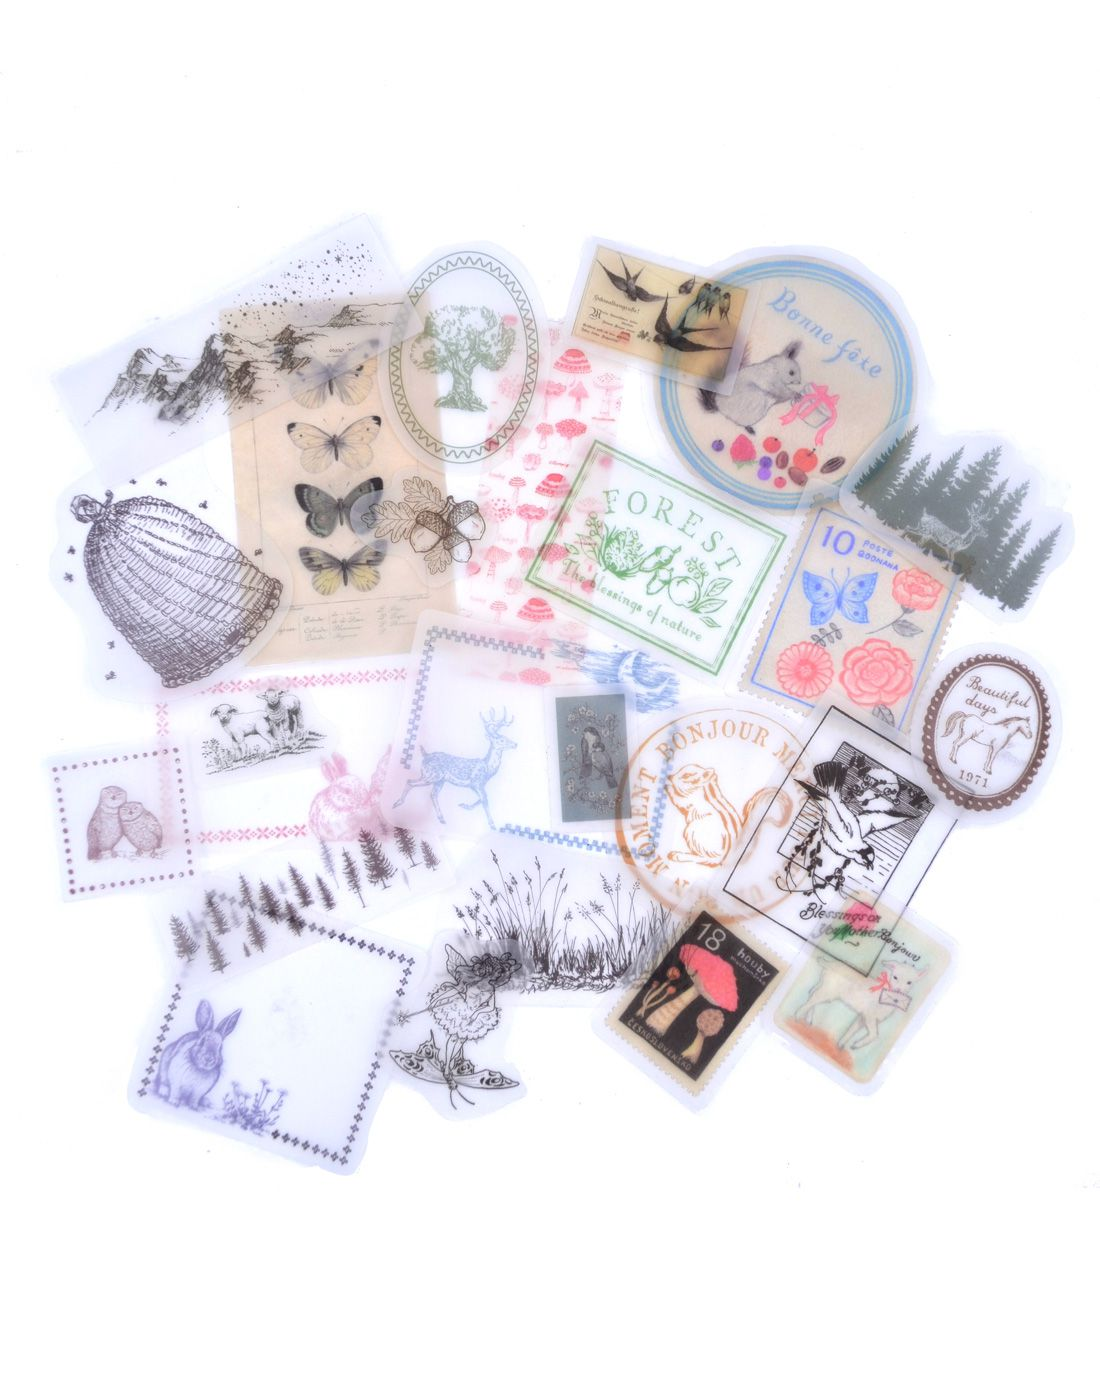 Adesivos de papel vegetal - Forest Story